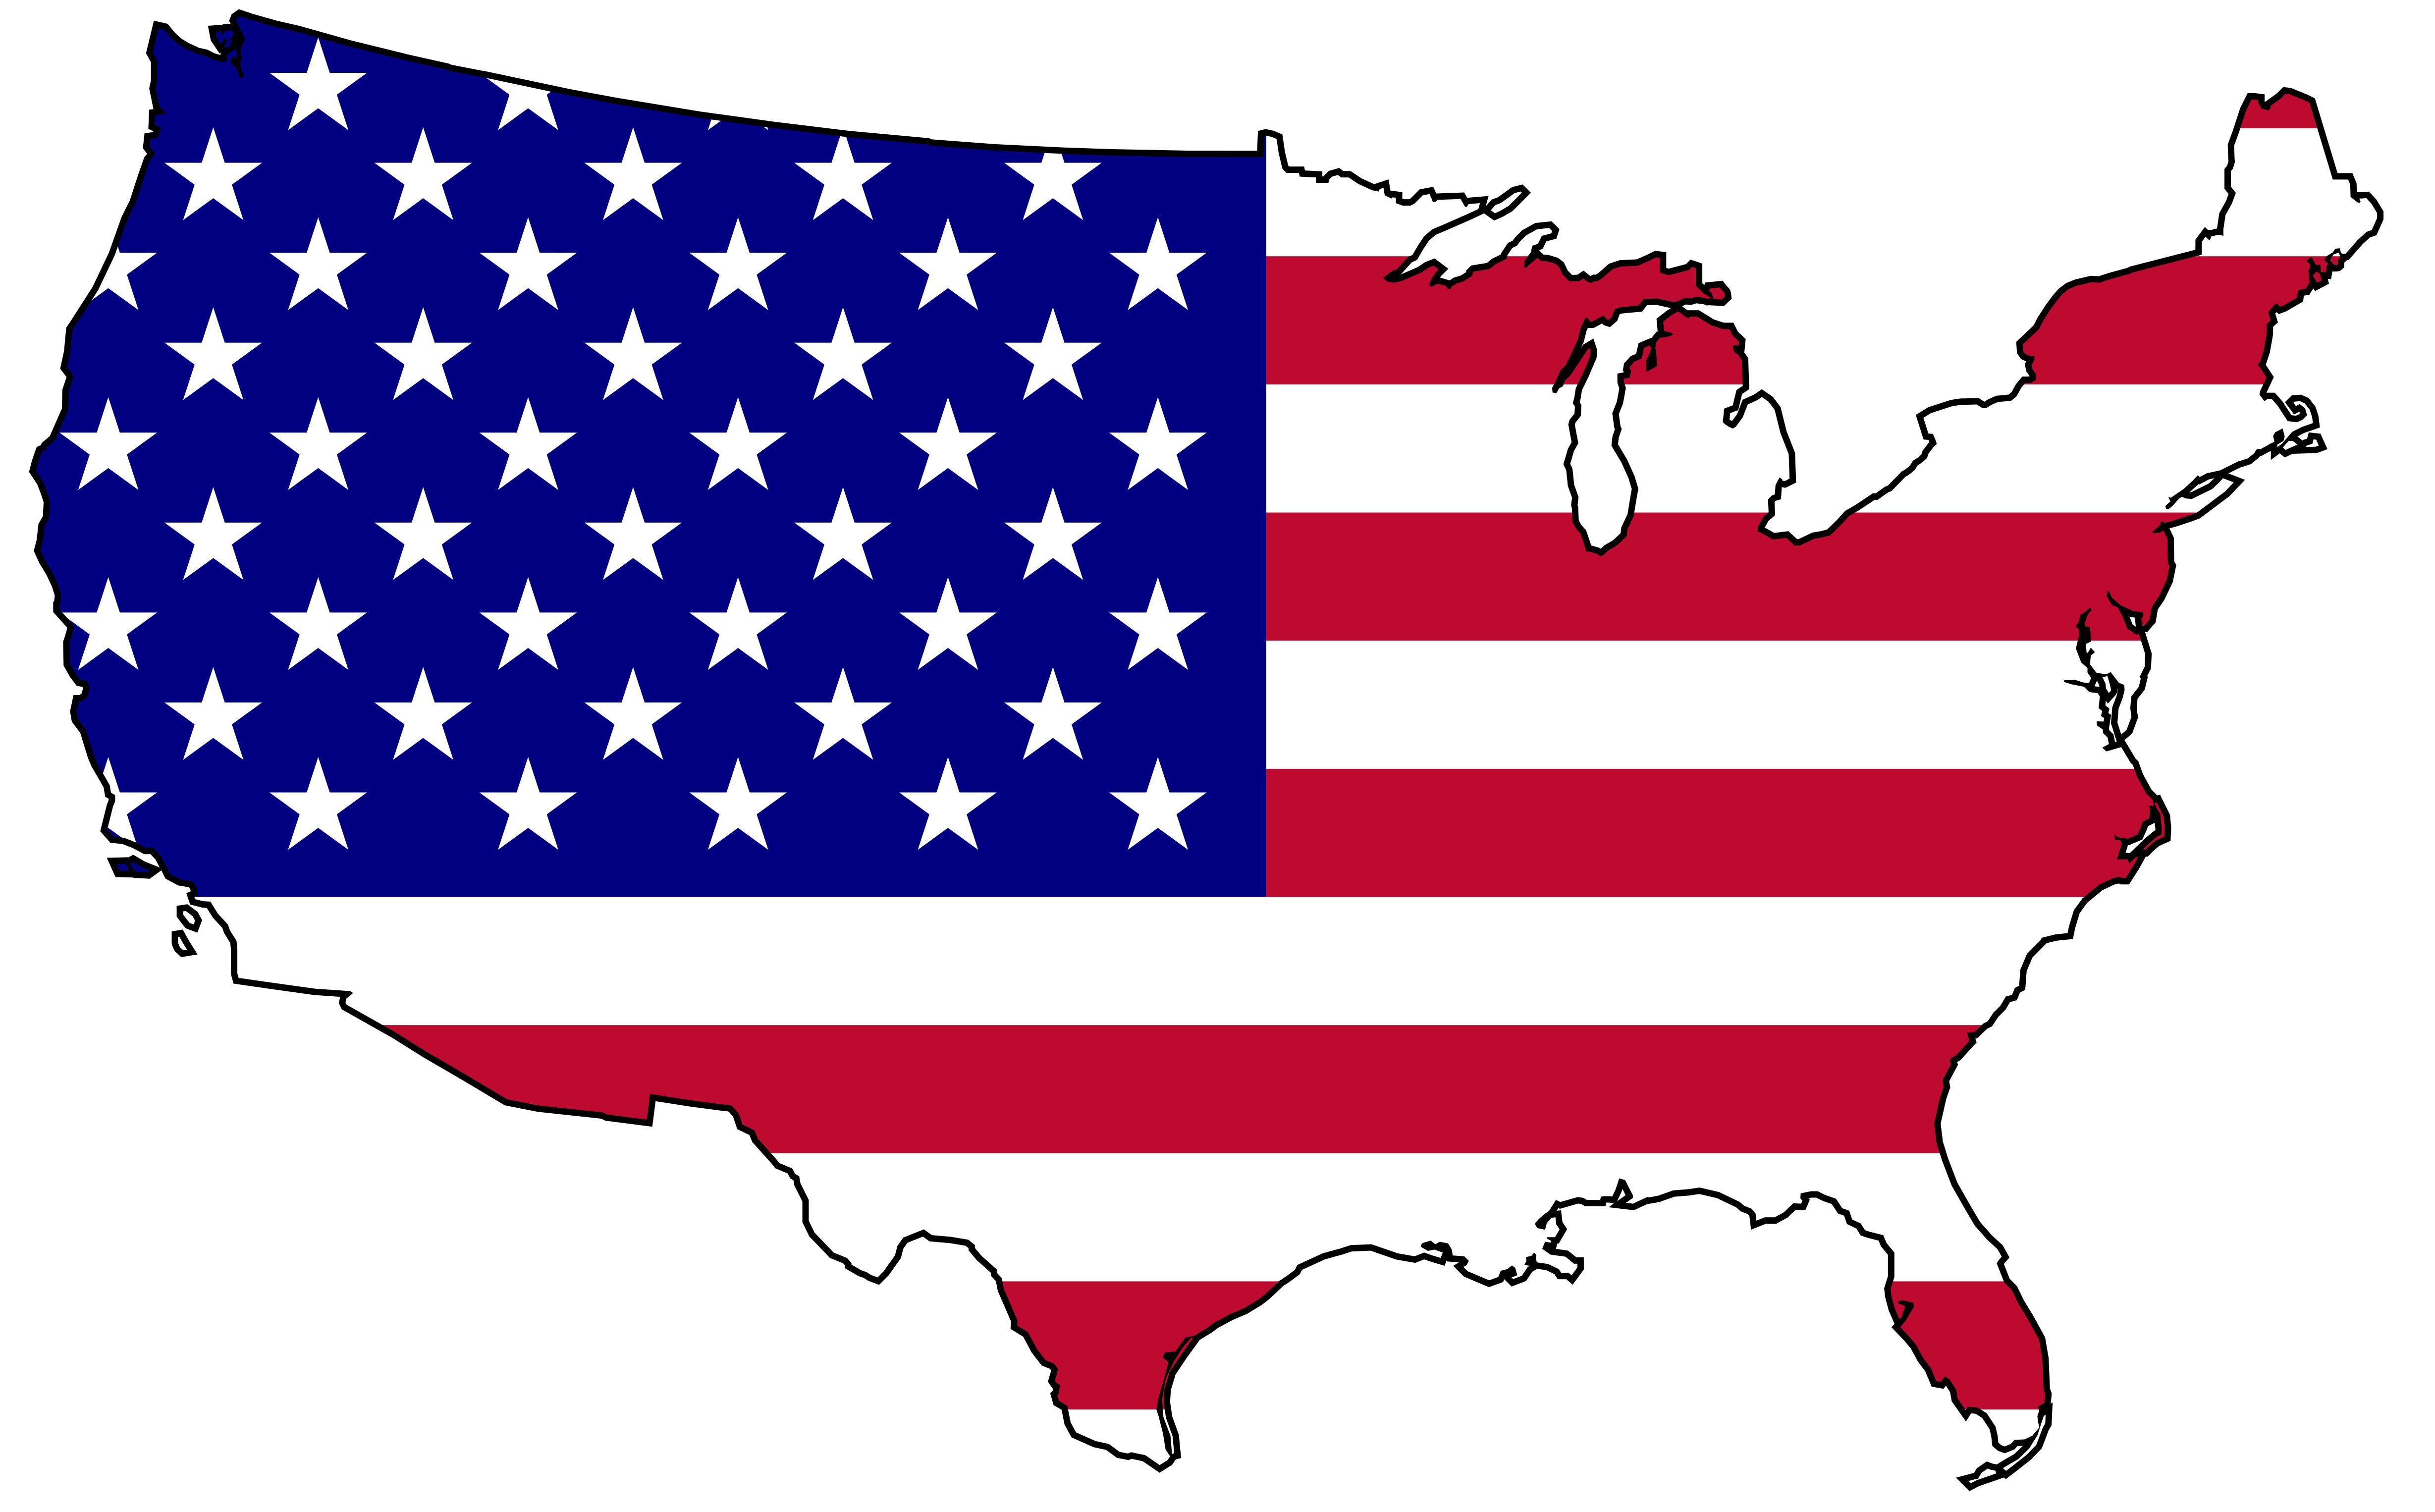 American Flag clipart us history Free Images Savoronmorehead Berkley Clipart